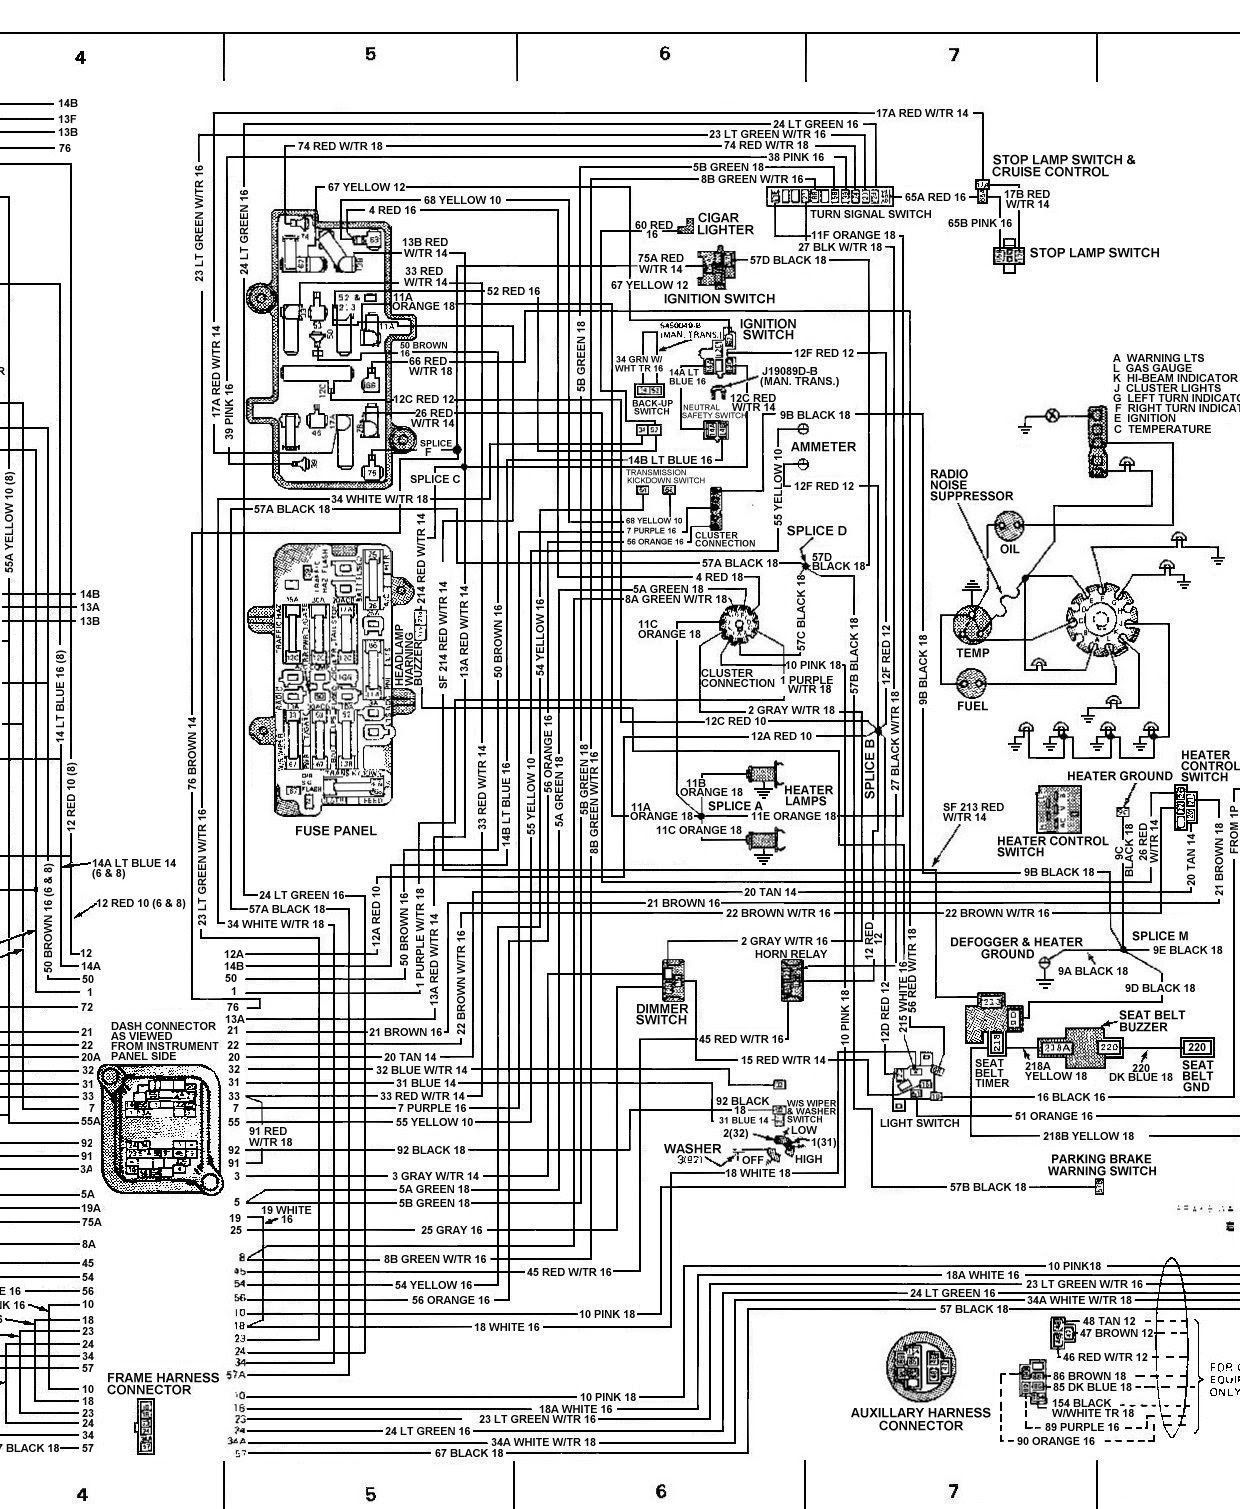 epic 2002 pt cruiser wiring diagram 76 about remodel led light bar epic 2002 pt cruiser wiring diagram 76 about remodel led light bar at